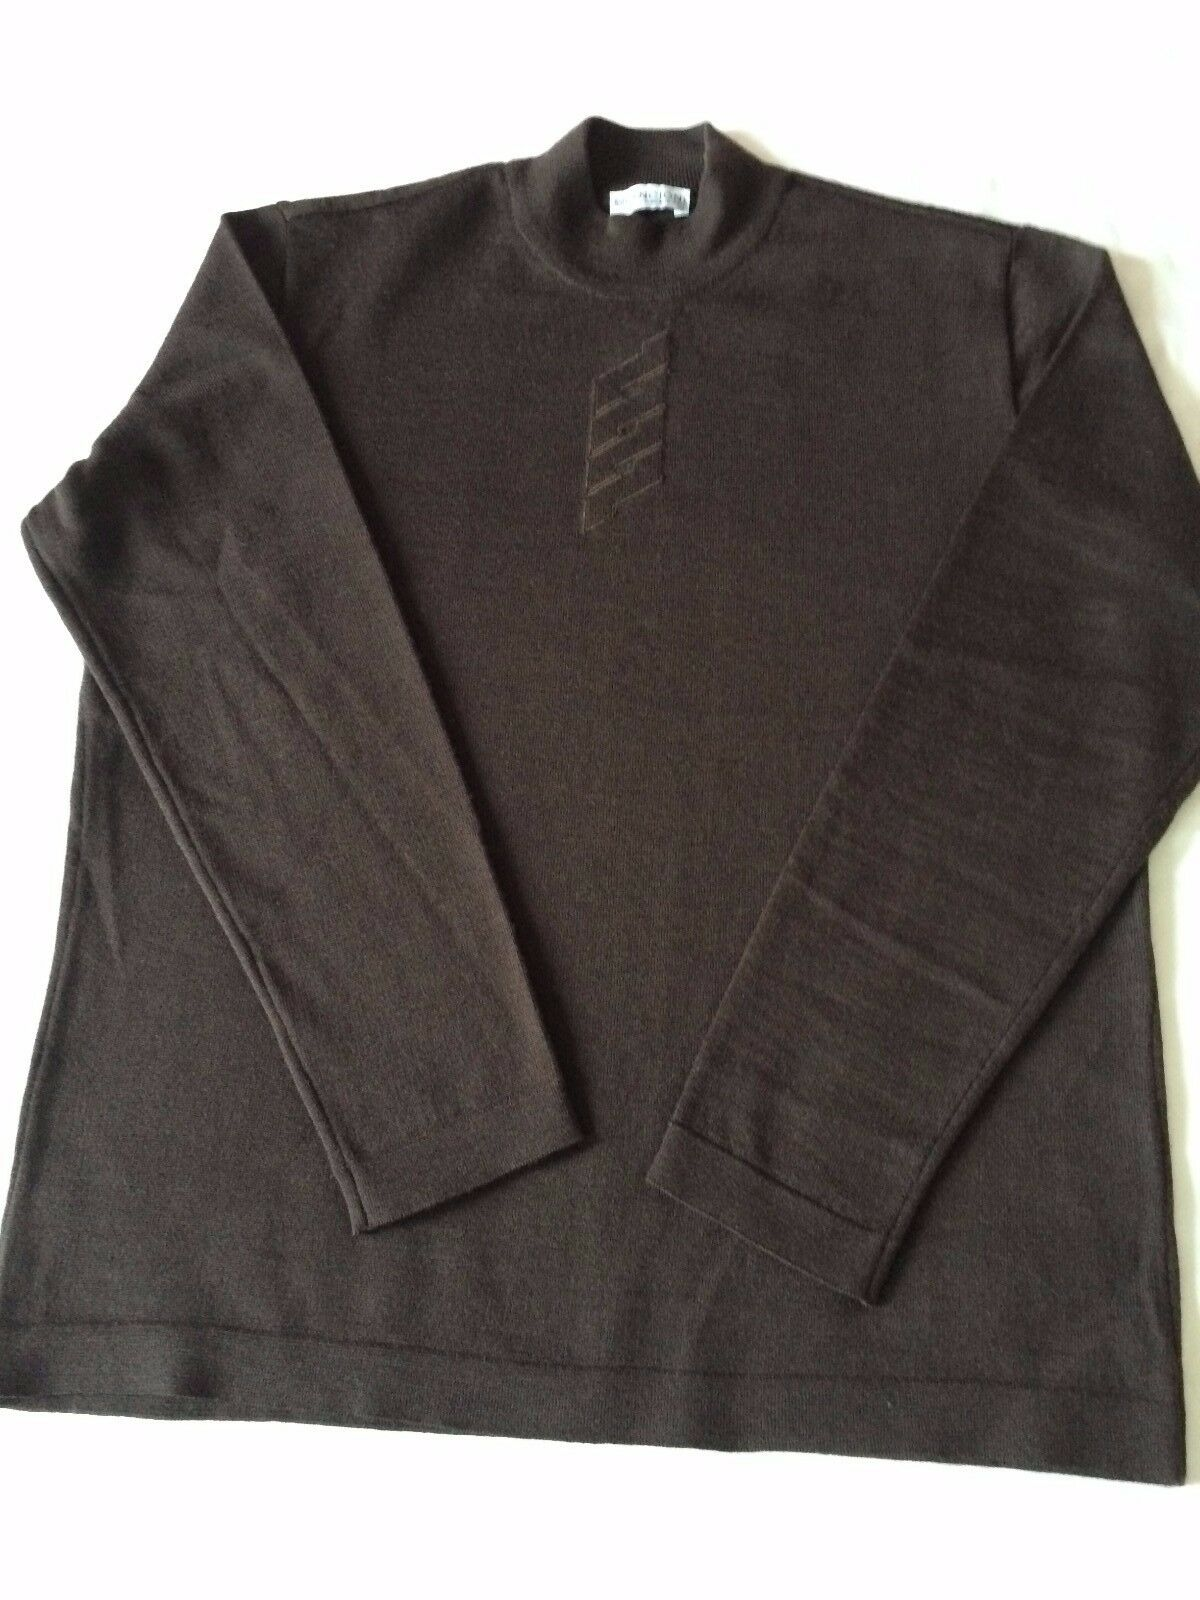 Men's Italian Designer Bilancioni Chocolate Brown 100%Wool Jumper Size L Excelle